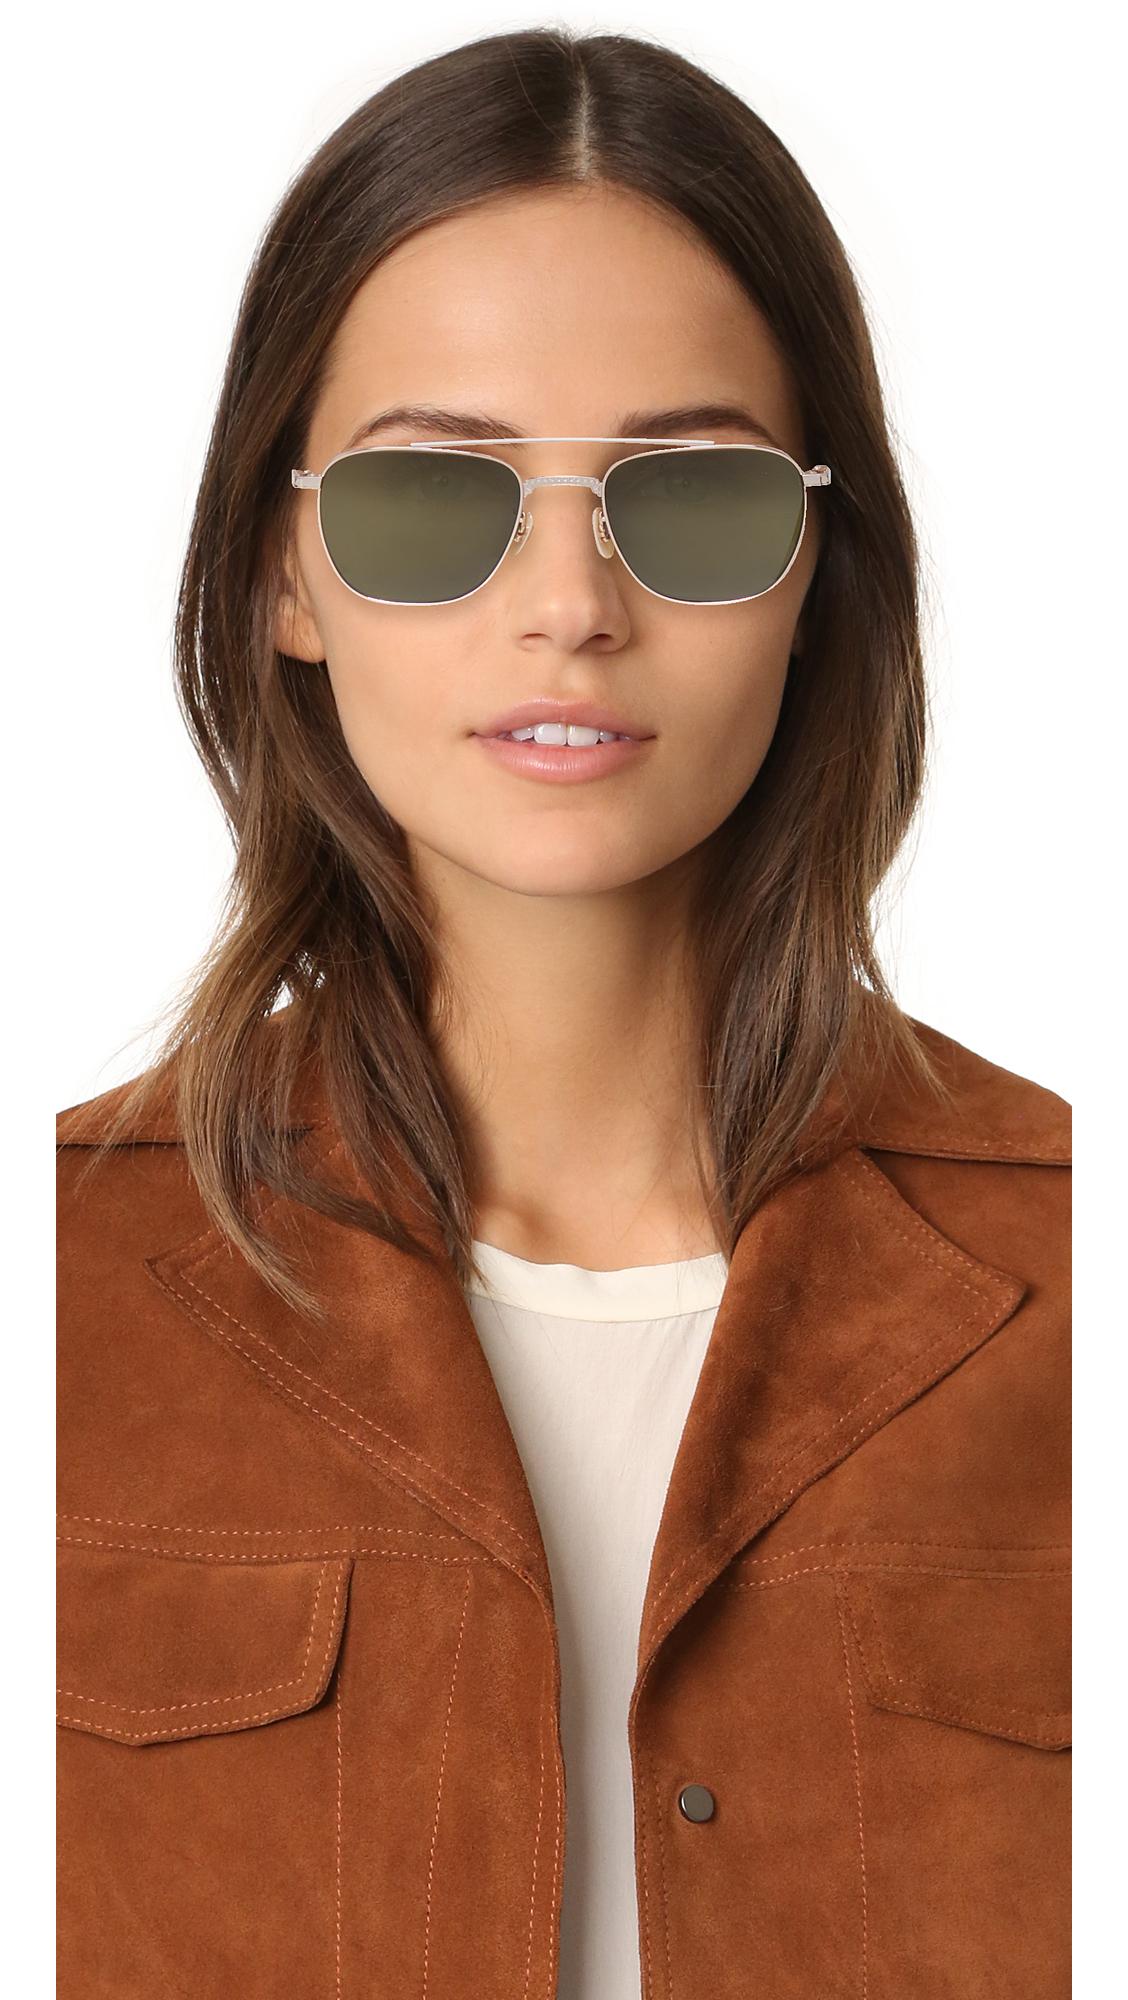 260a0b67d7 GARRETT LEIGHT Riviera Sunglasses